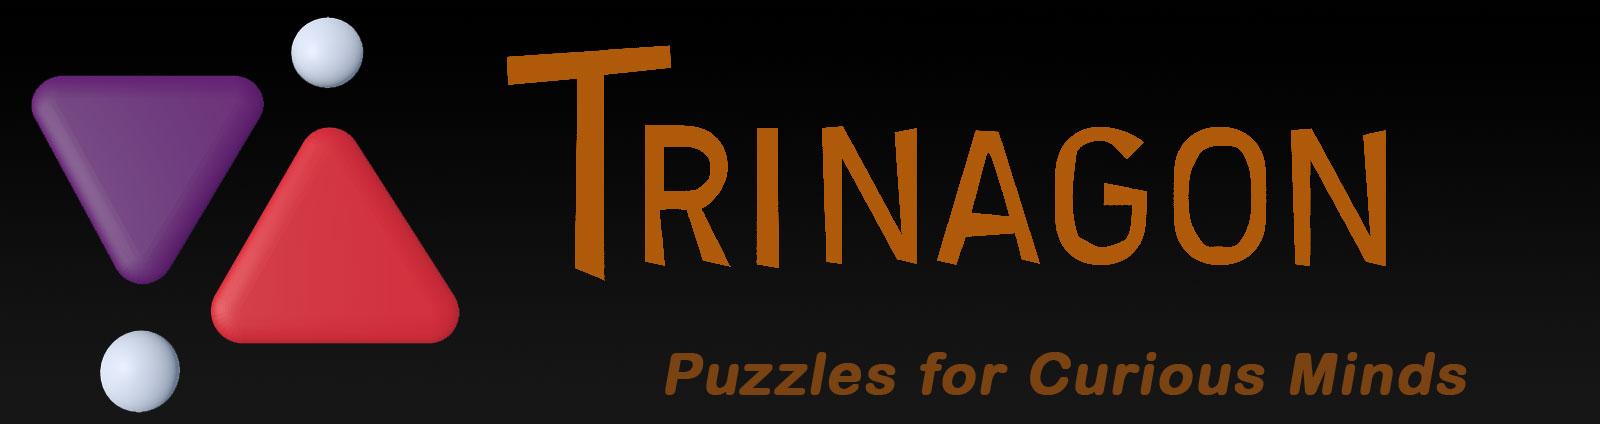 Trinagon 3D Free